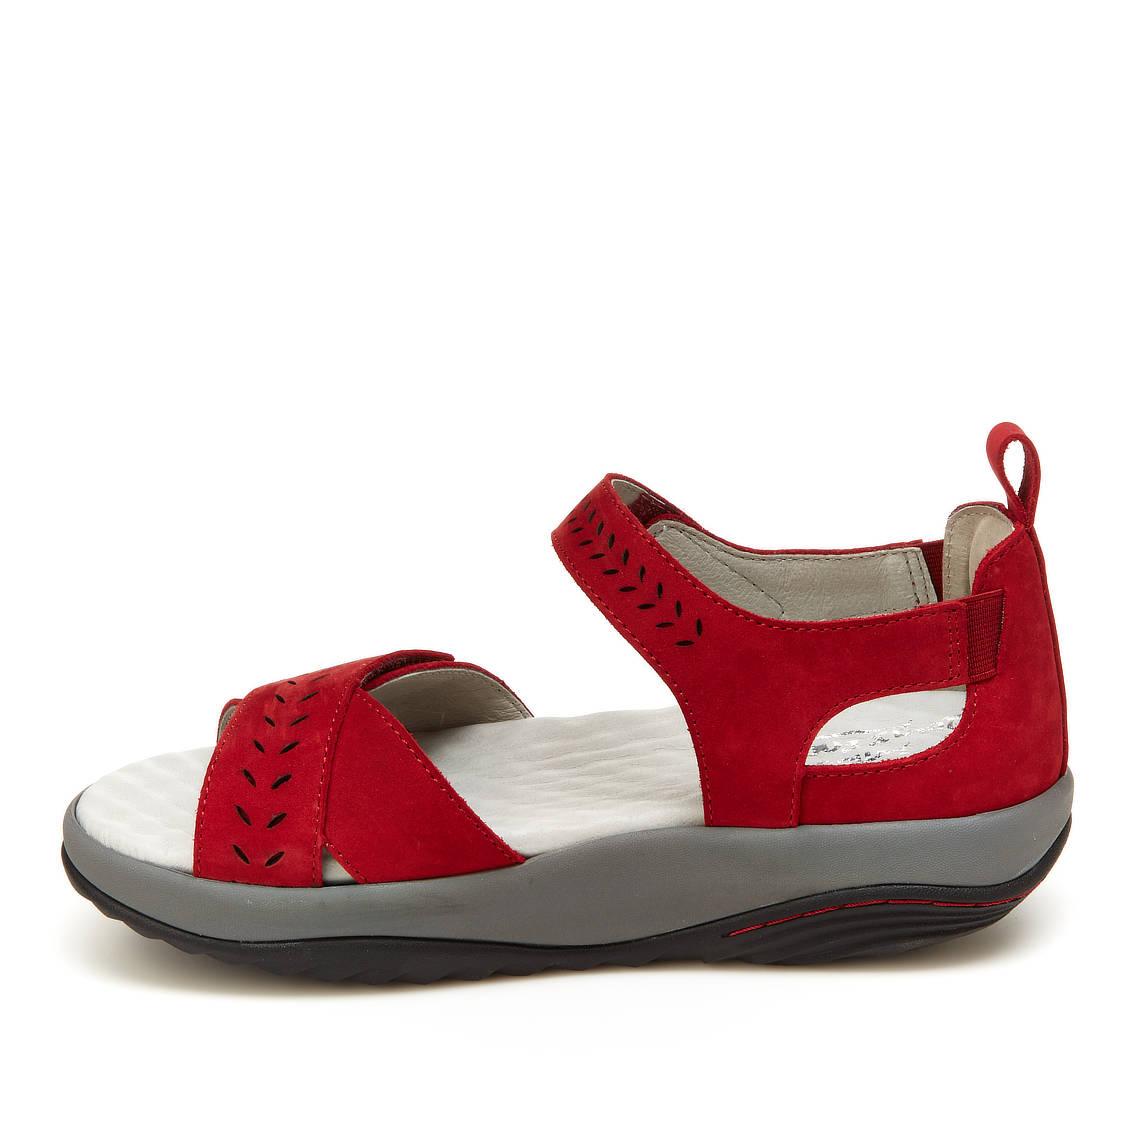 jambu-sedona-j1sed03-red-4